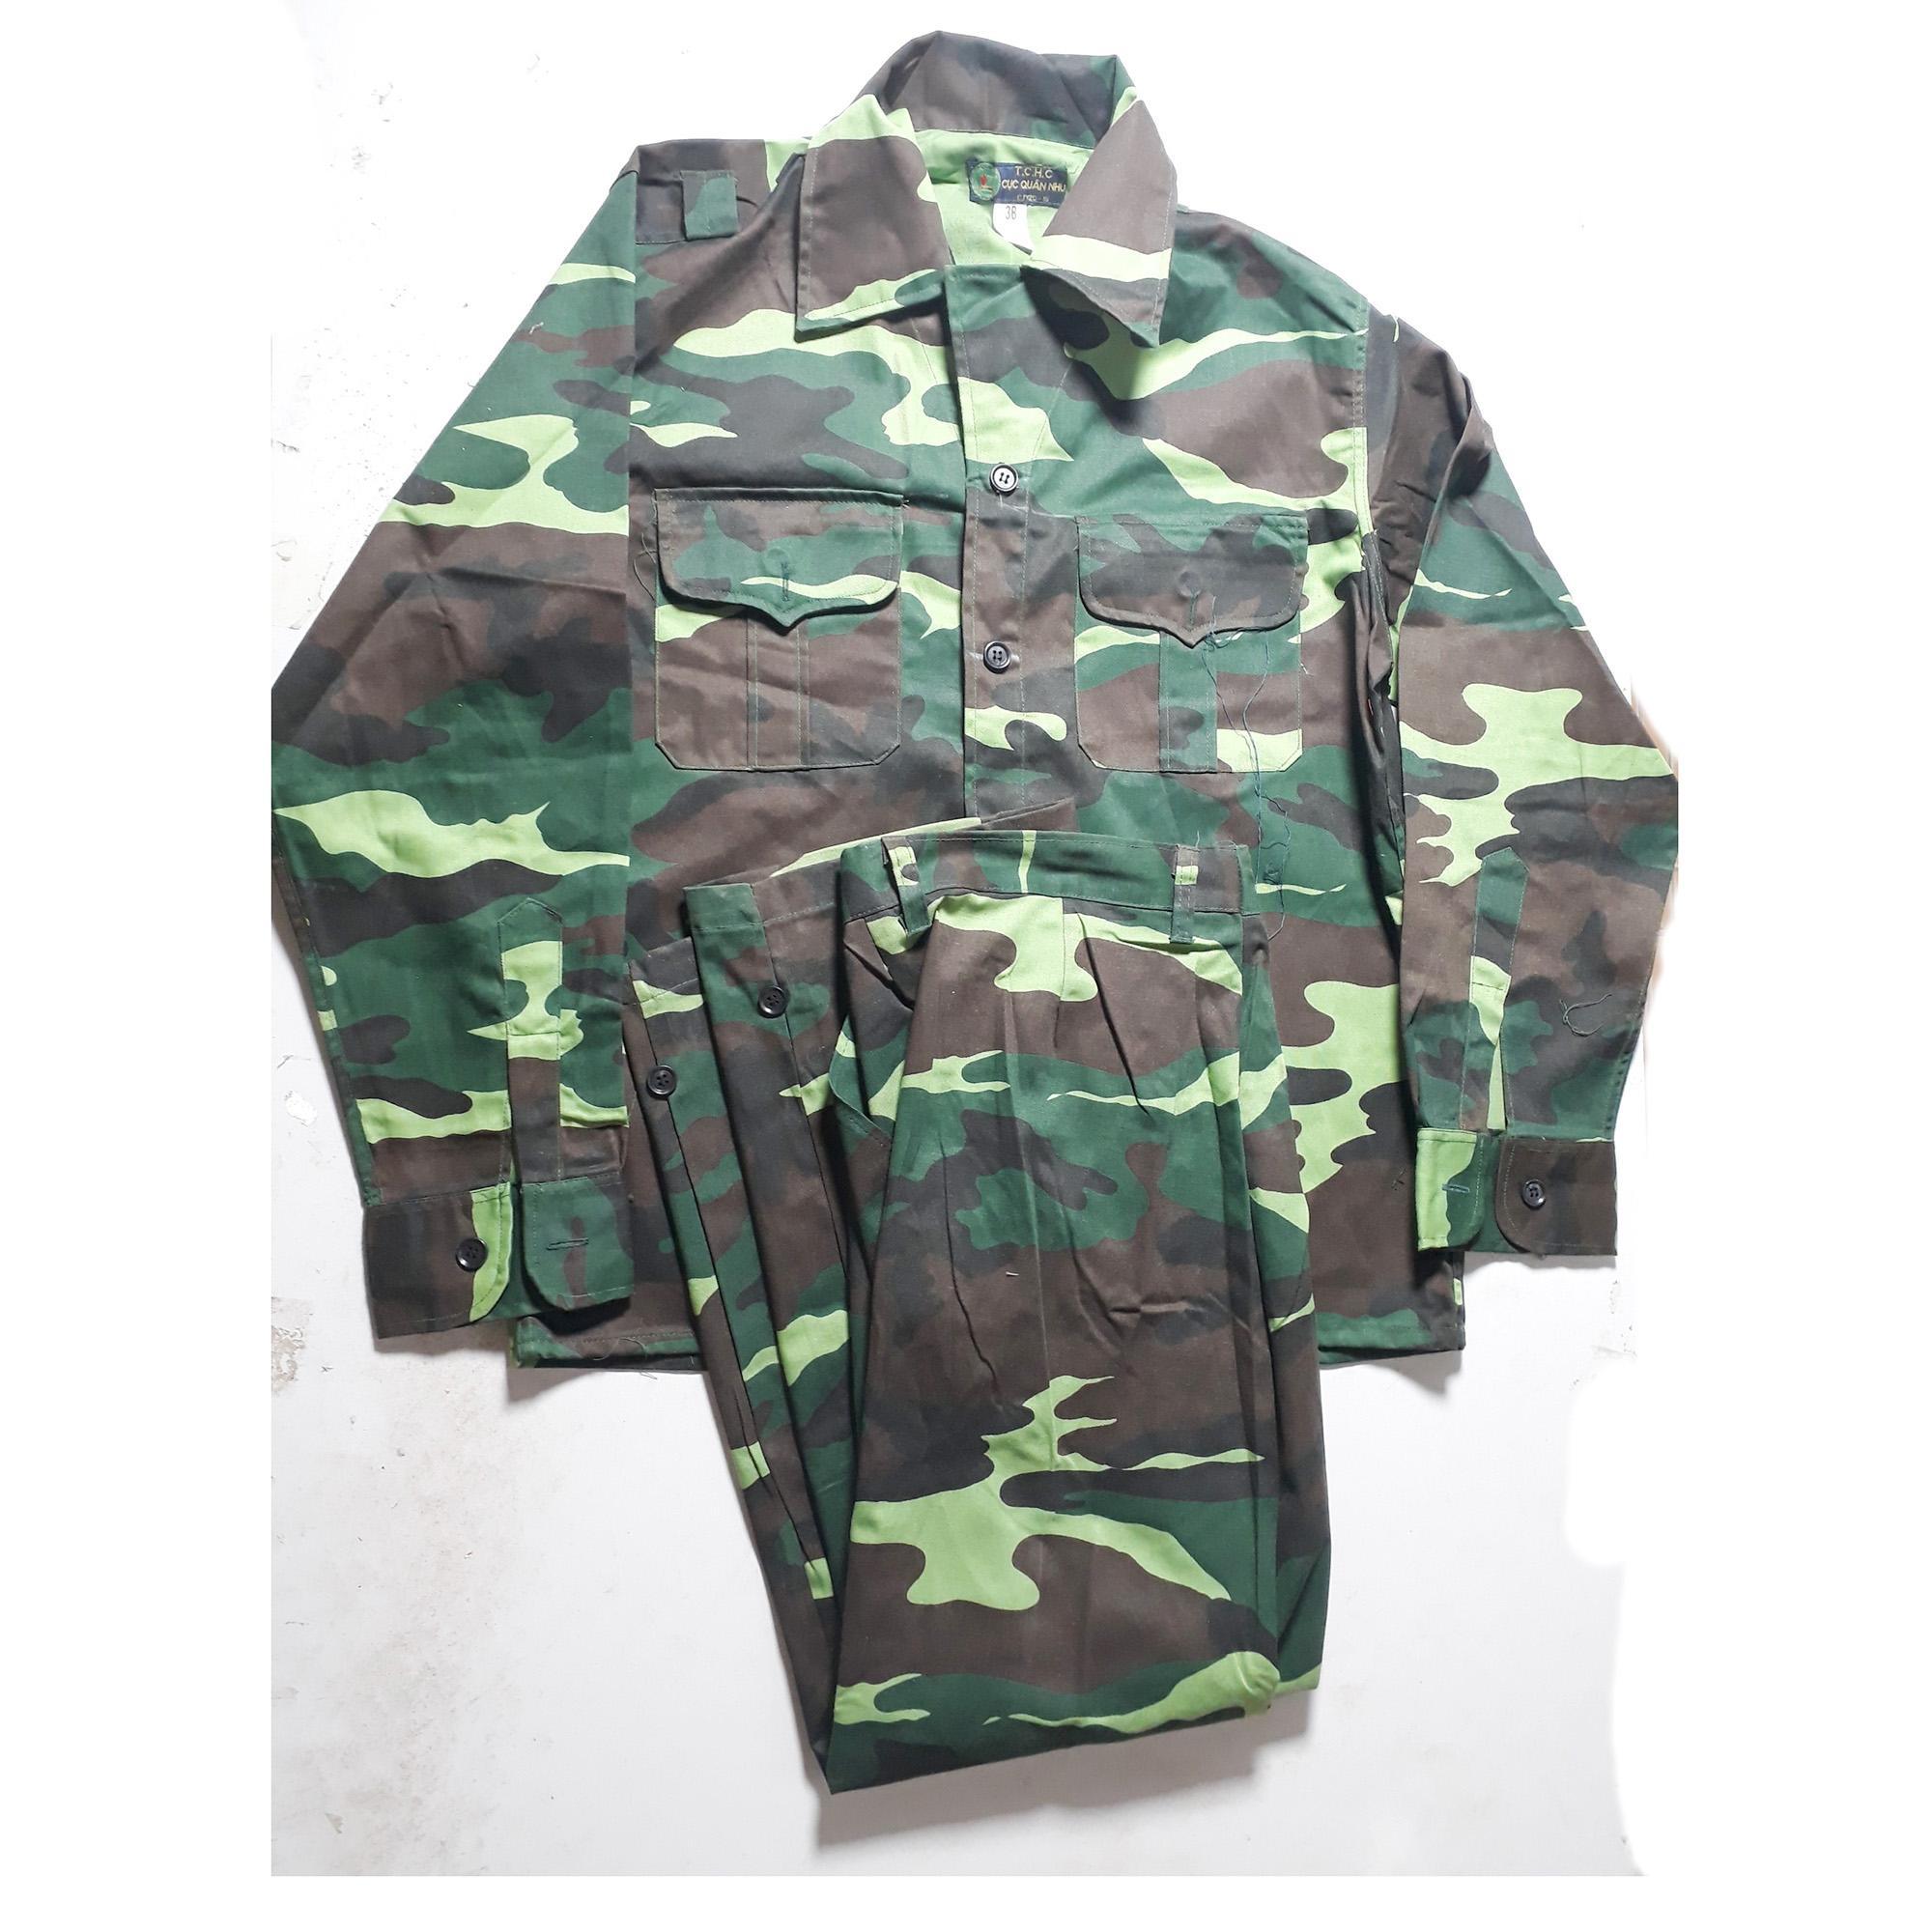 Bộ quần áo rằn ri bộ đội